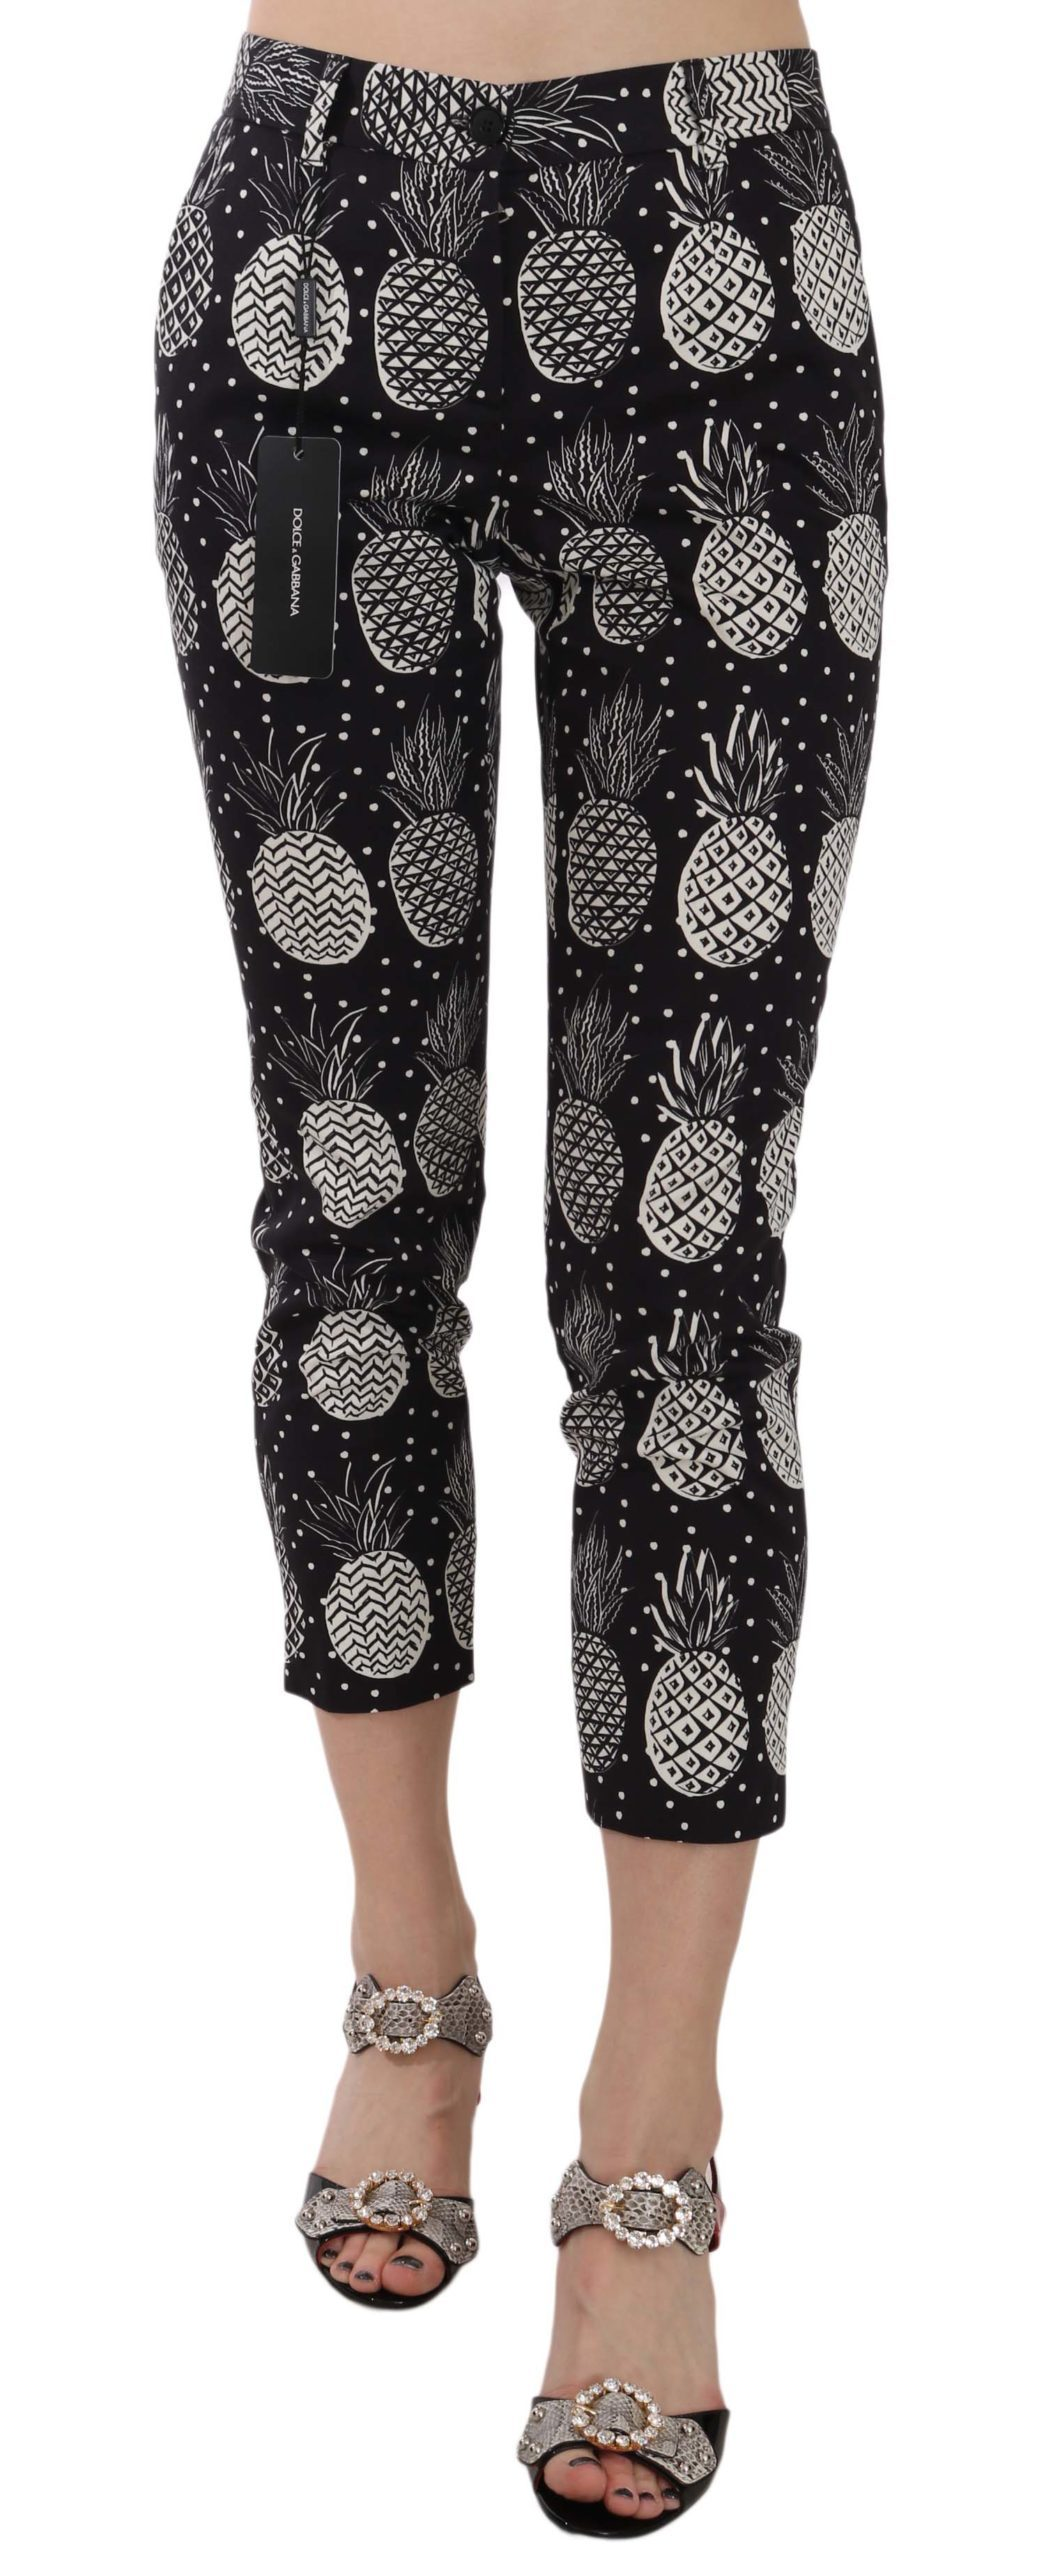 Dolce & Gabbana Women's Pineapple Print Skinny Trouser Black PAN70045 - IT38|XS